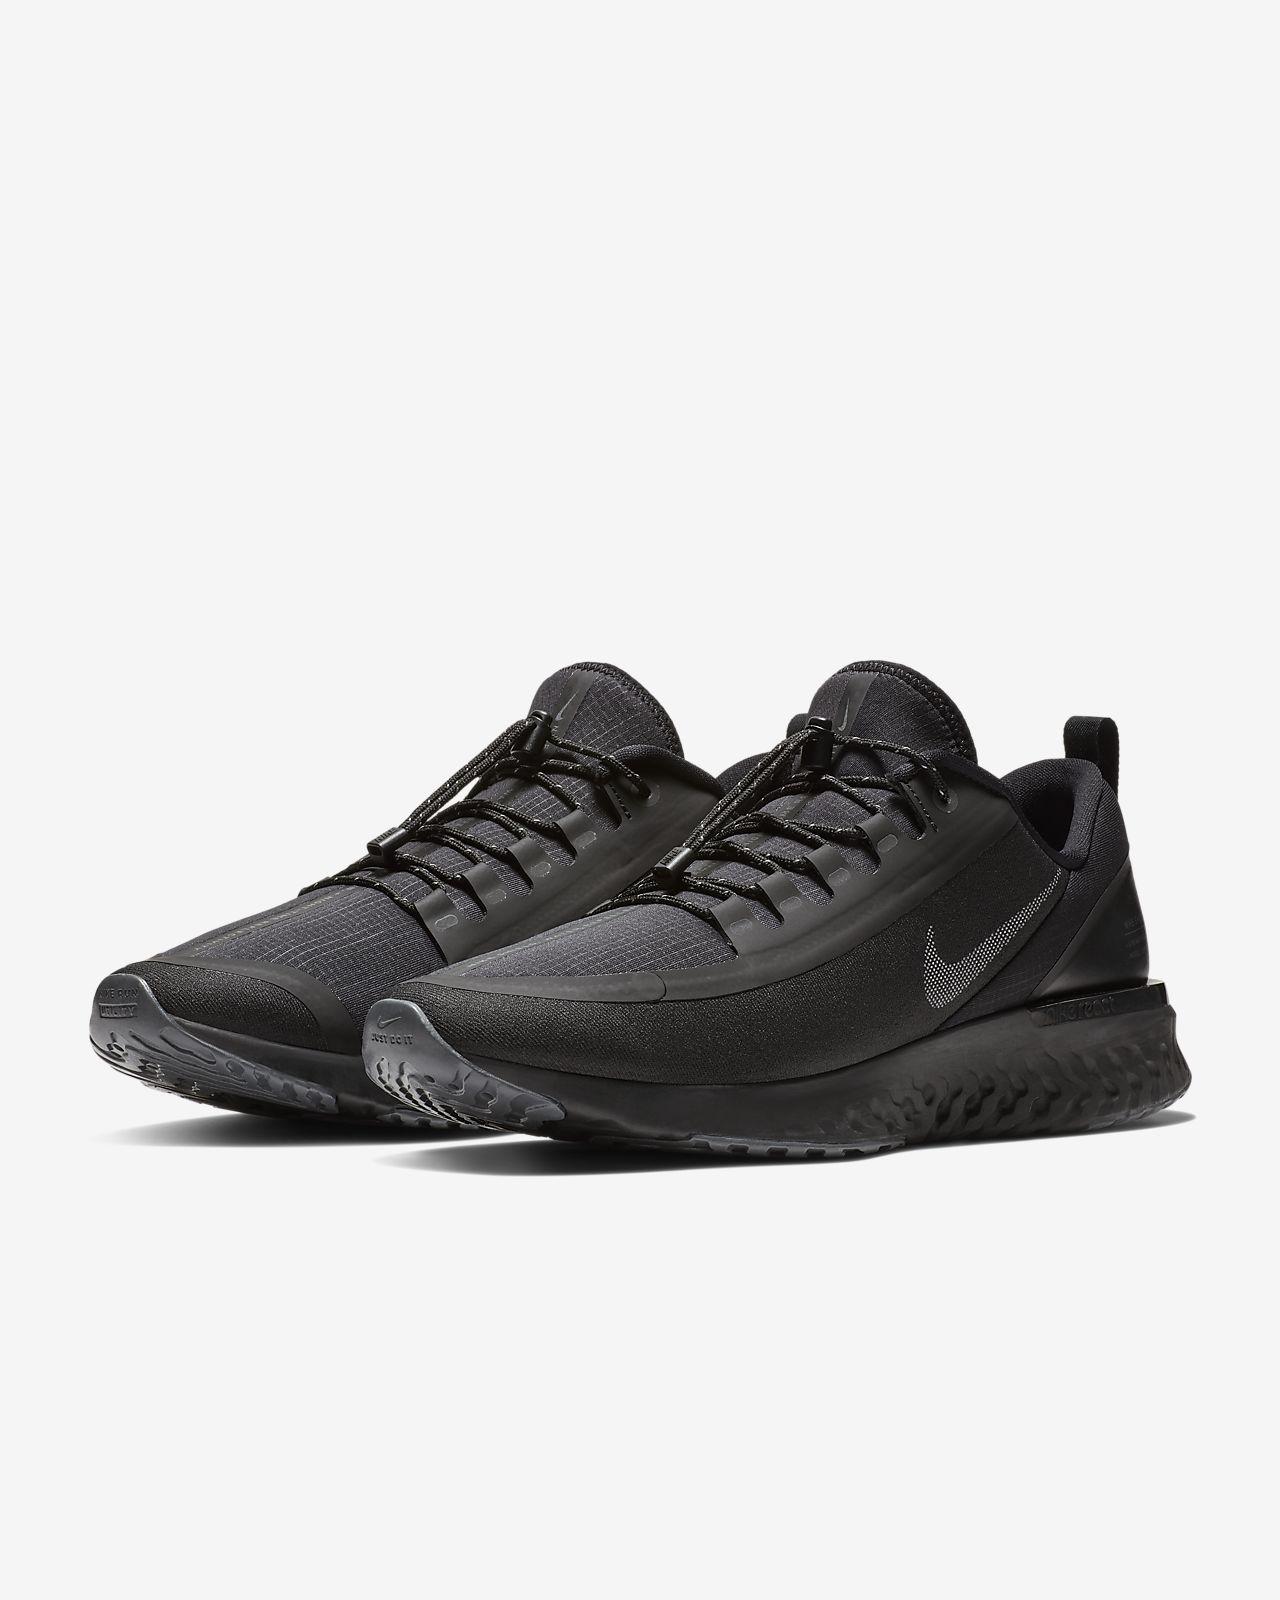 1b49e2c62fe7 Nike Odyssey React Shield Water-Repellent Men s Running Shoe. Nike ...